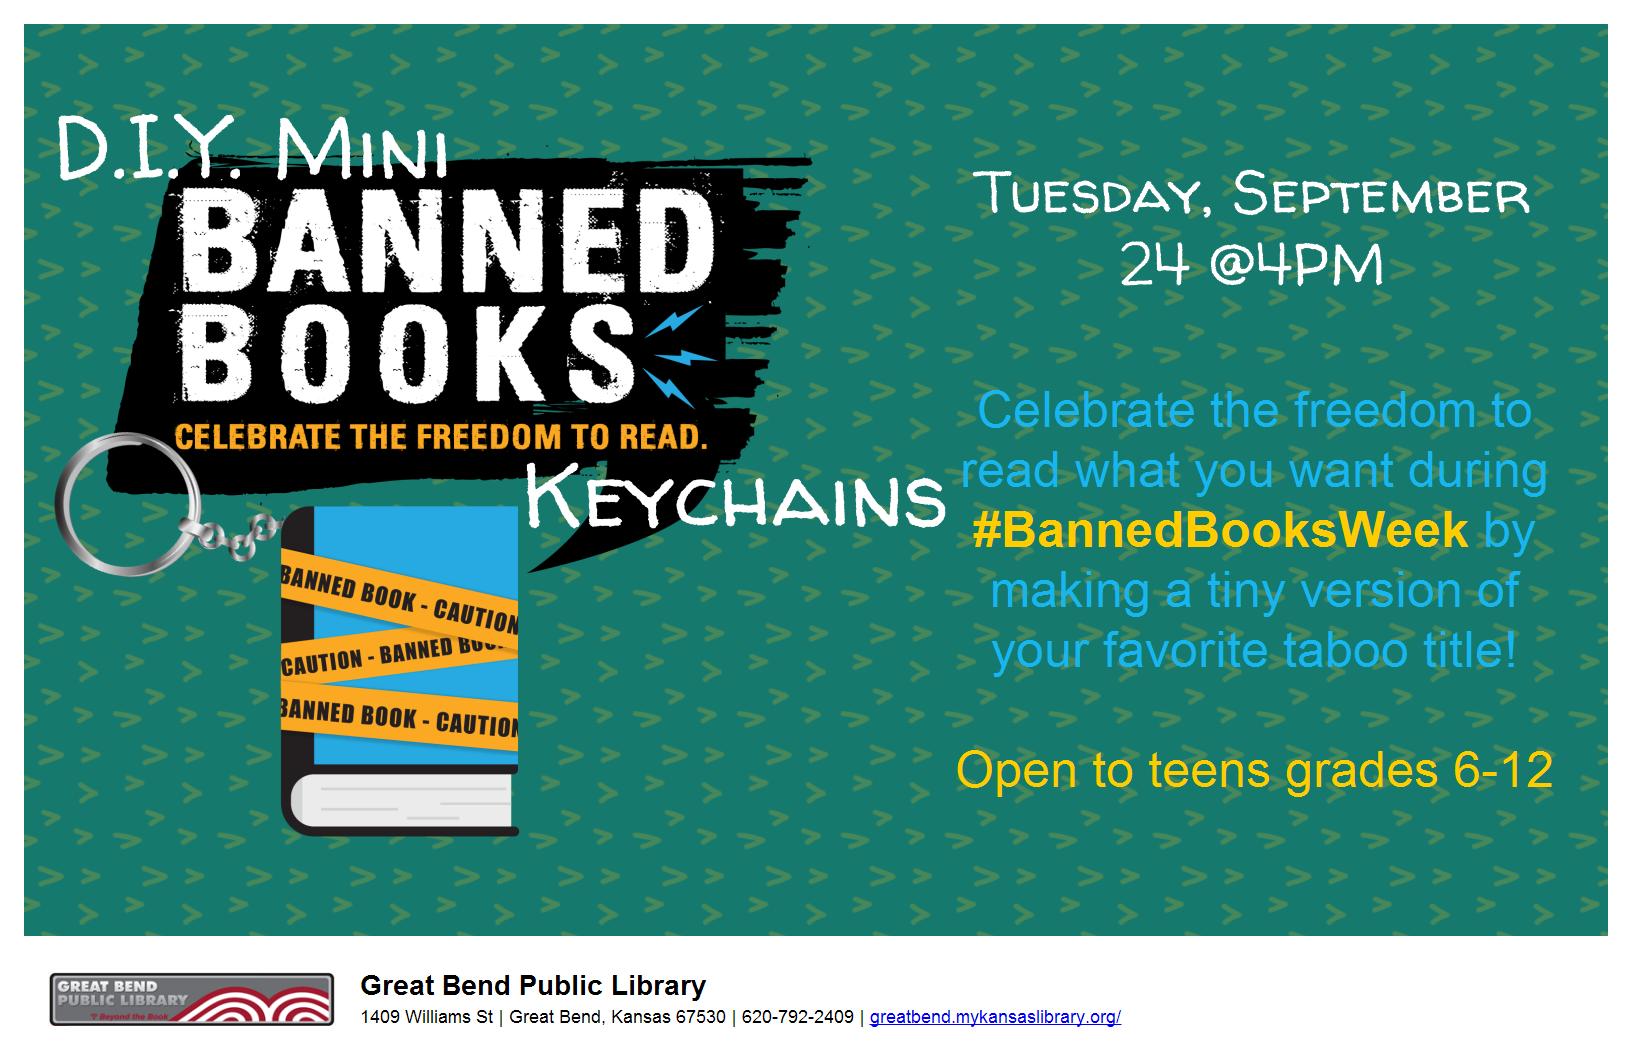 Teen Craft: D.I.Y Mini Banned Books Keychains